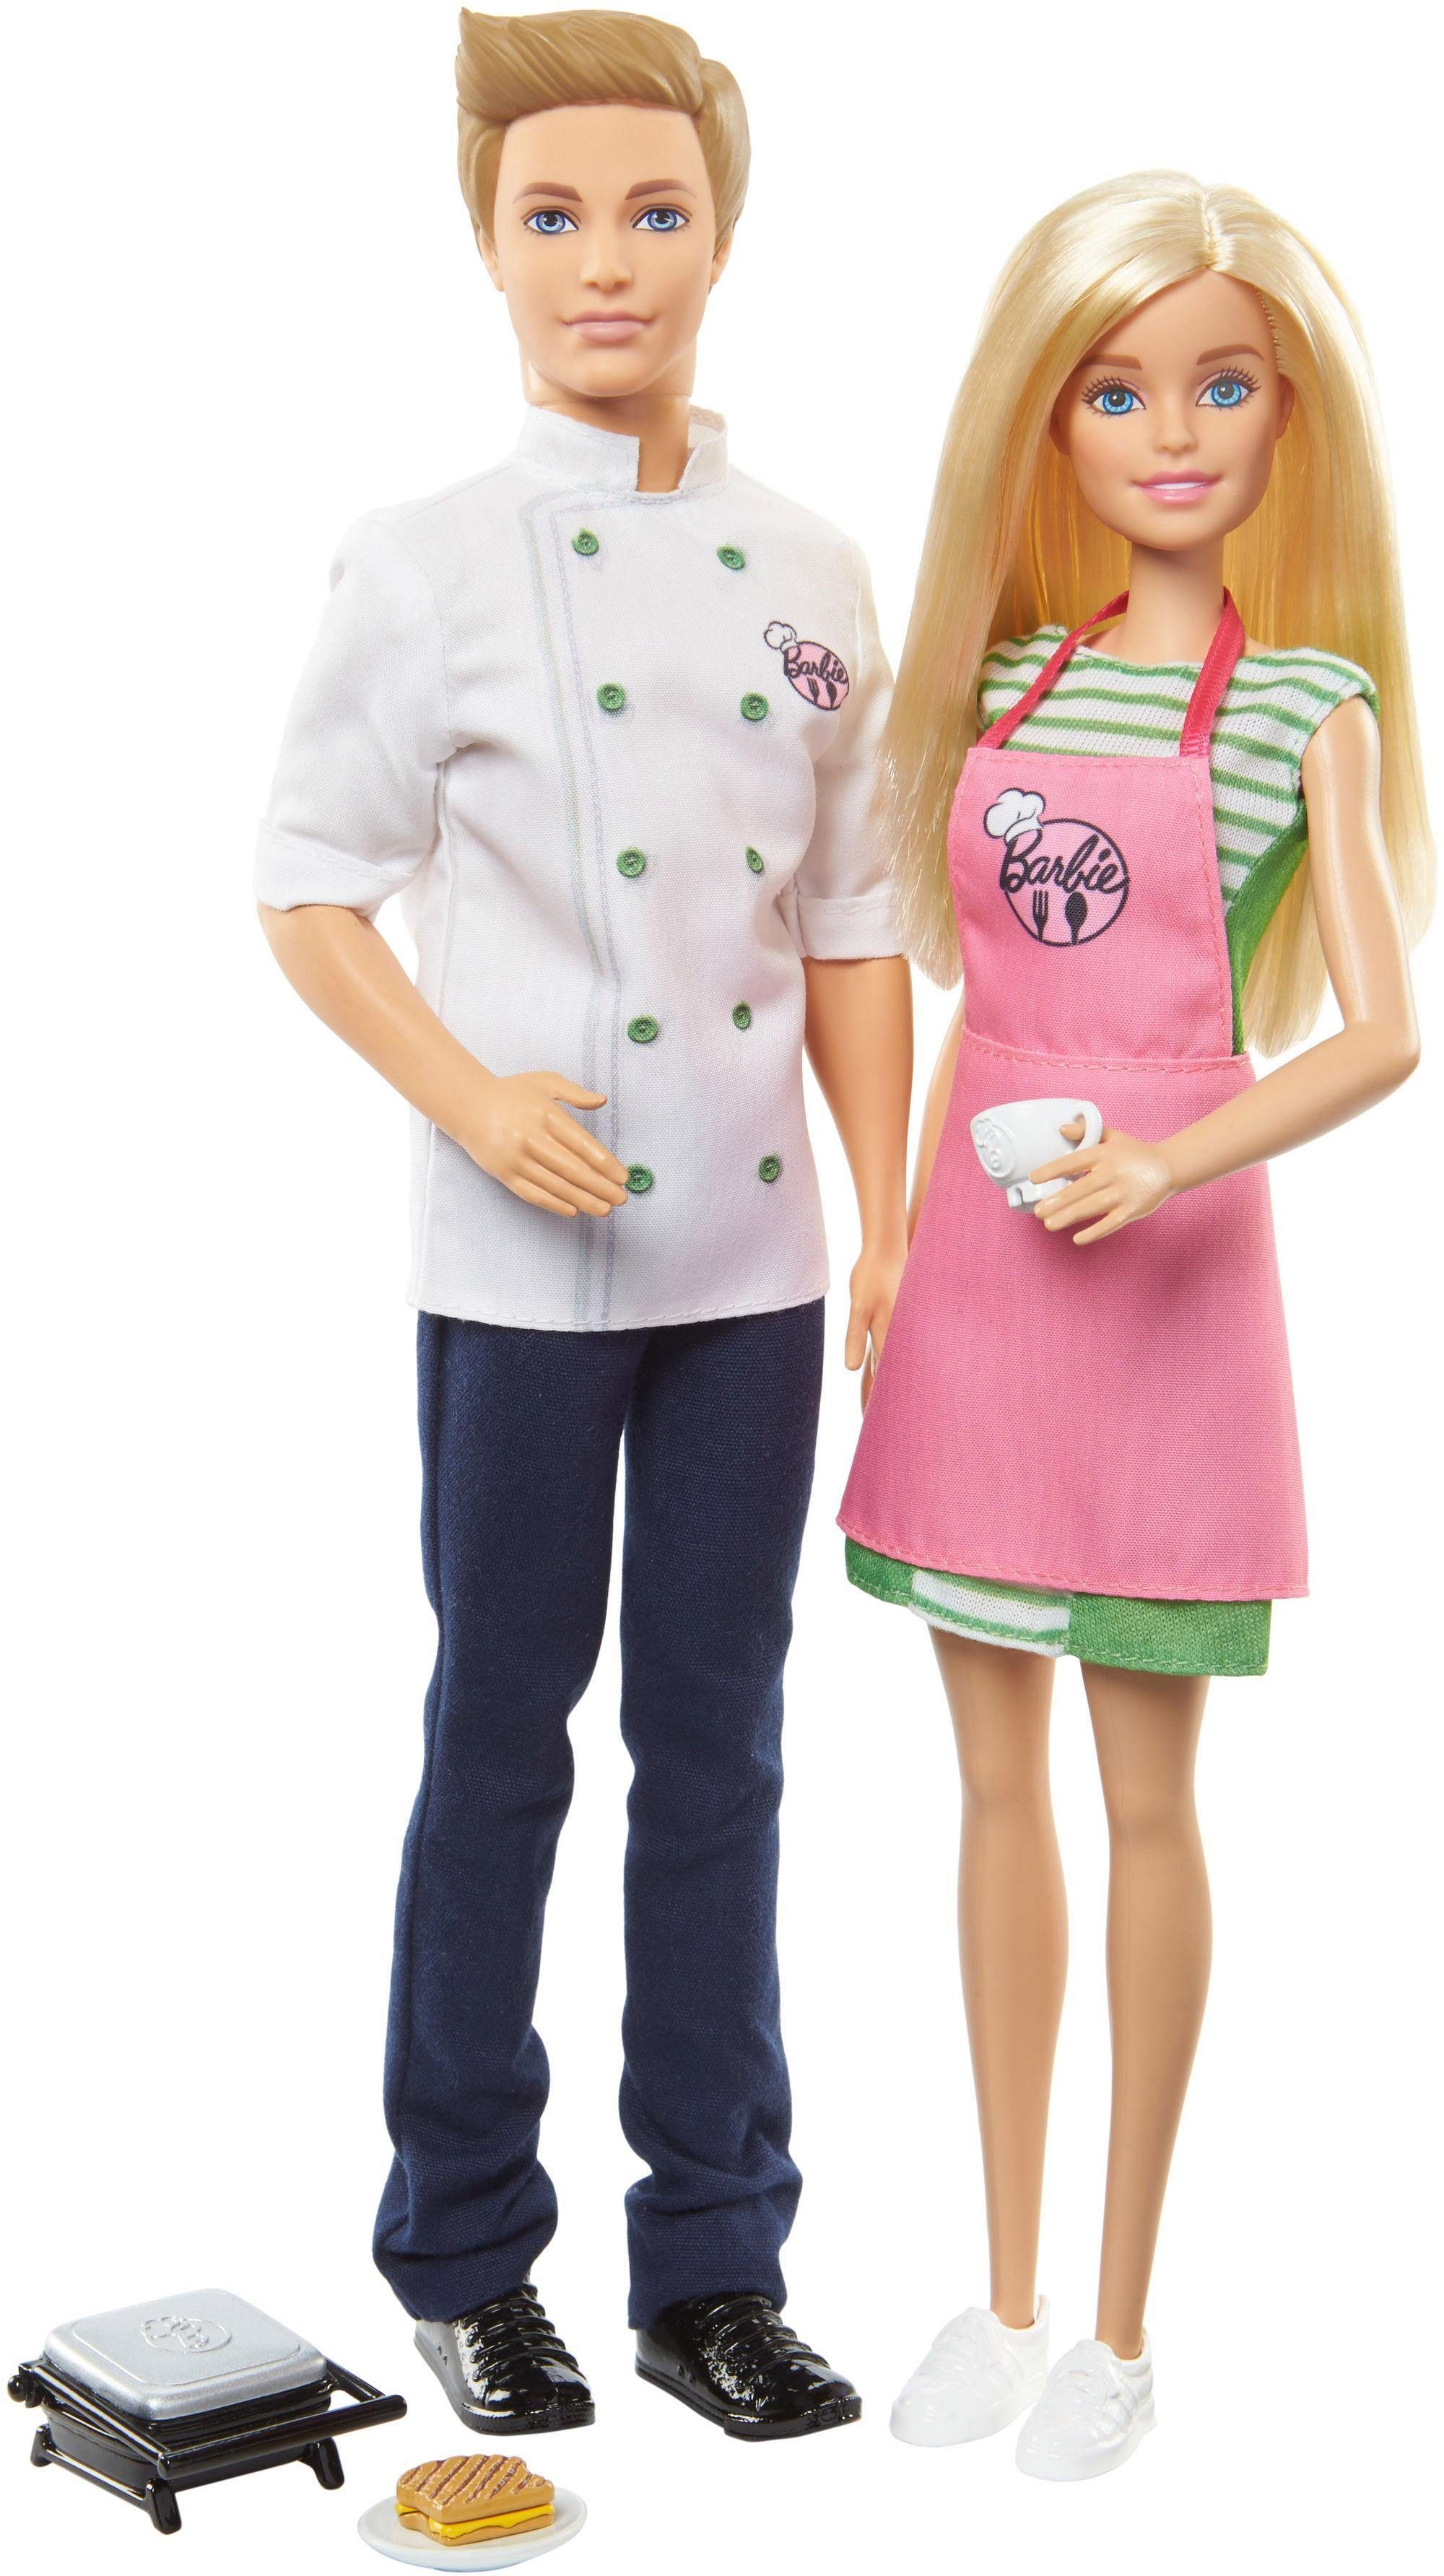 Mattel Puppe mit Spielset, »Cooking & Baking, Barbie & Ken Puppen Geschenkset«